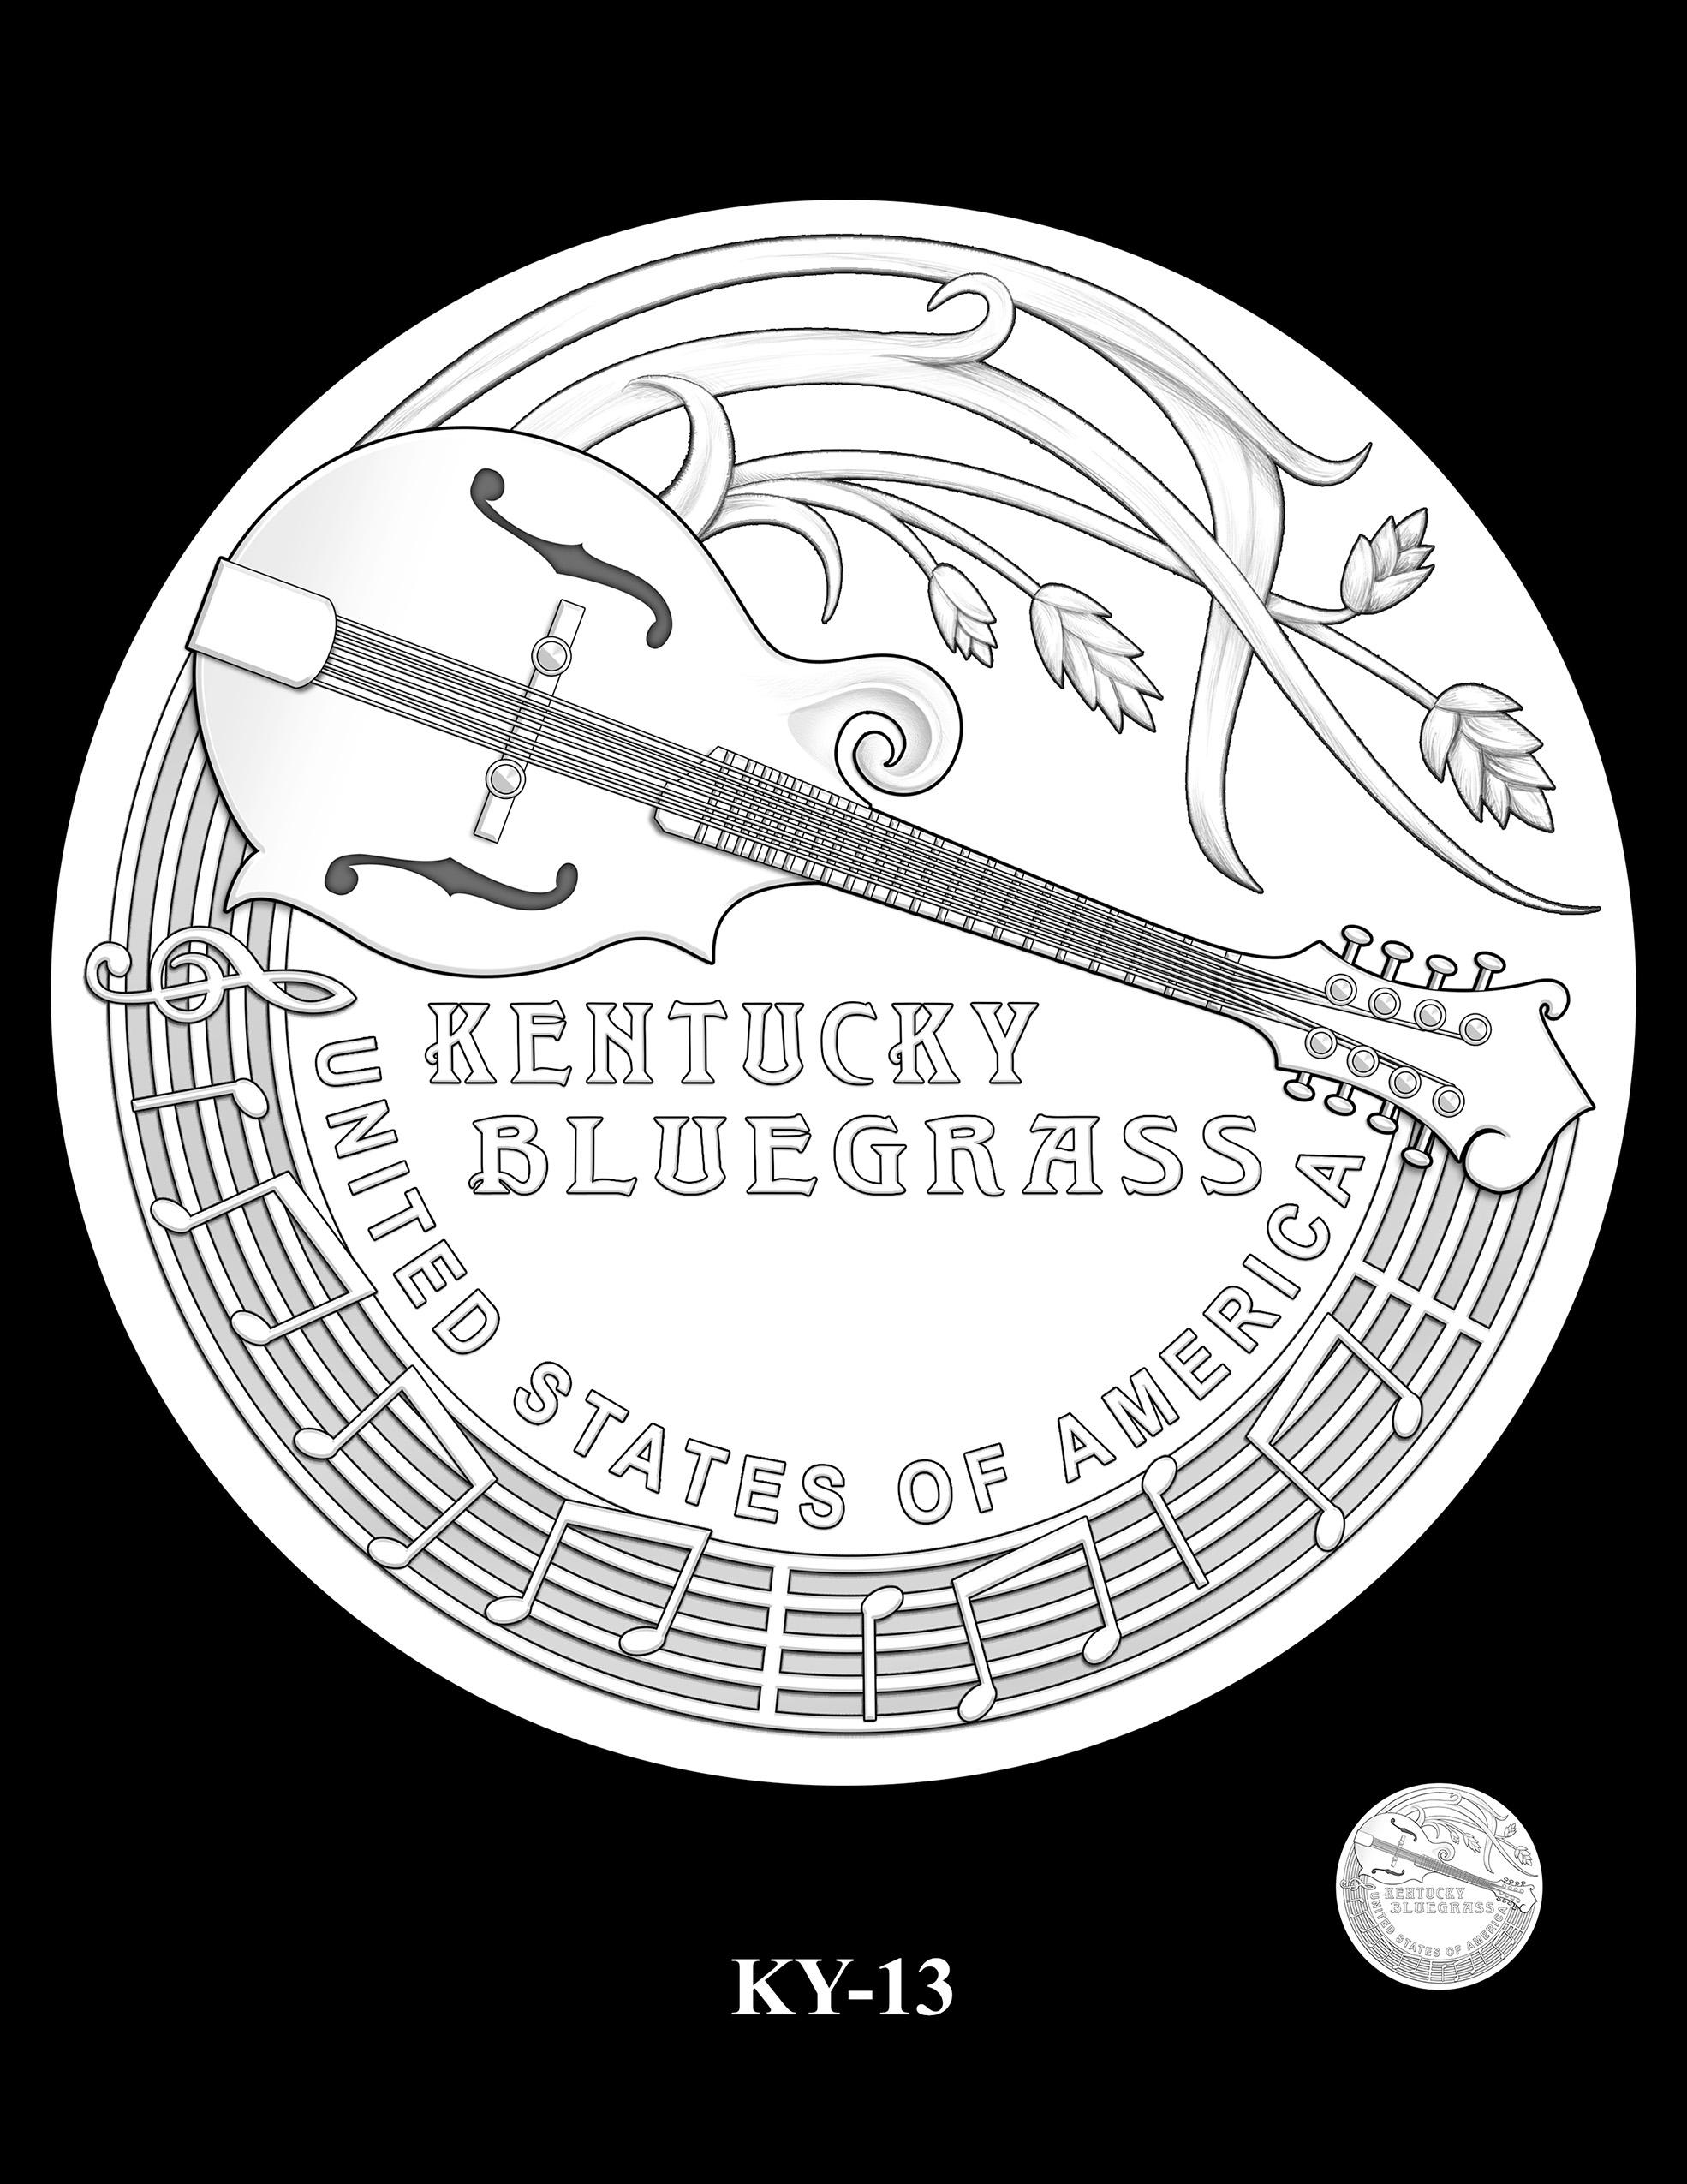 KY-13 -- 2022 American Innovation $1 Coin - Kentucky